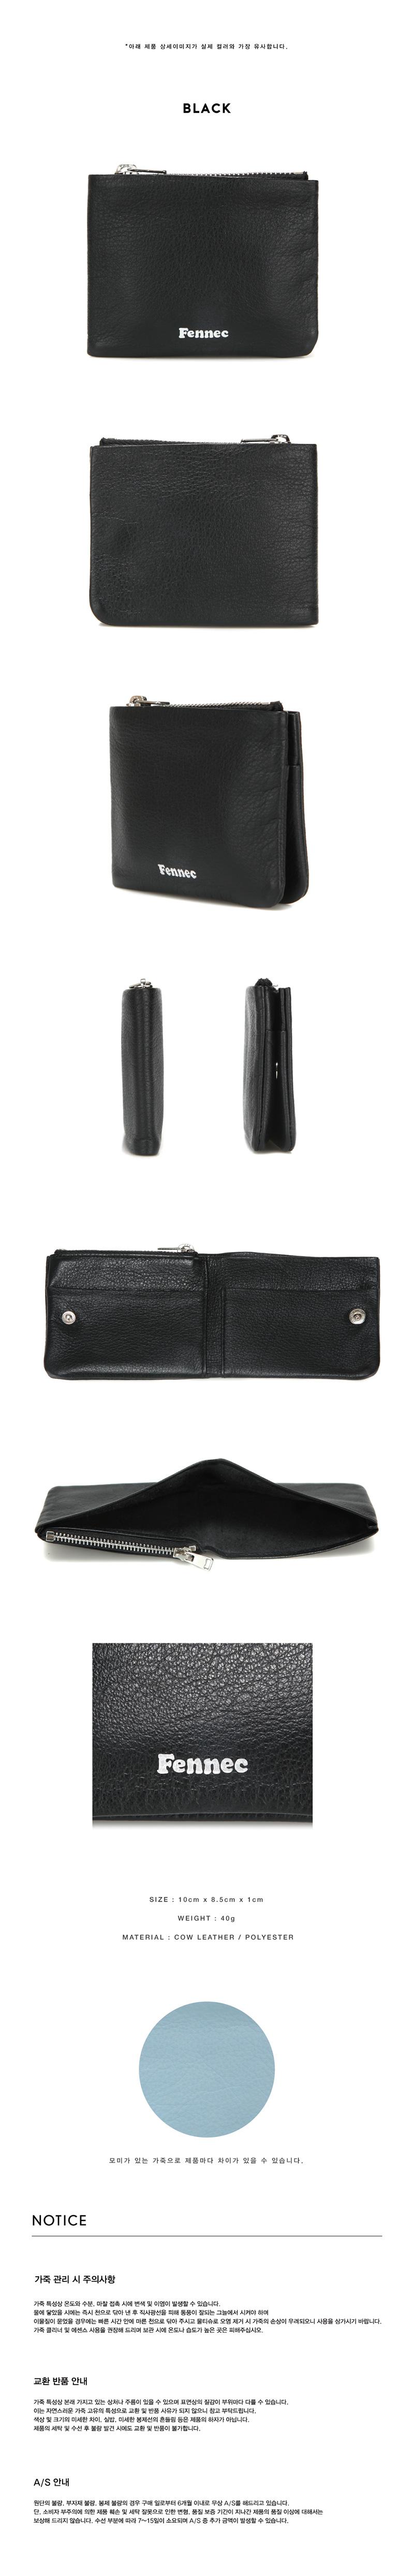 soft-fold-wallet-black.jpg